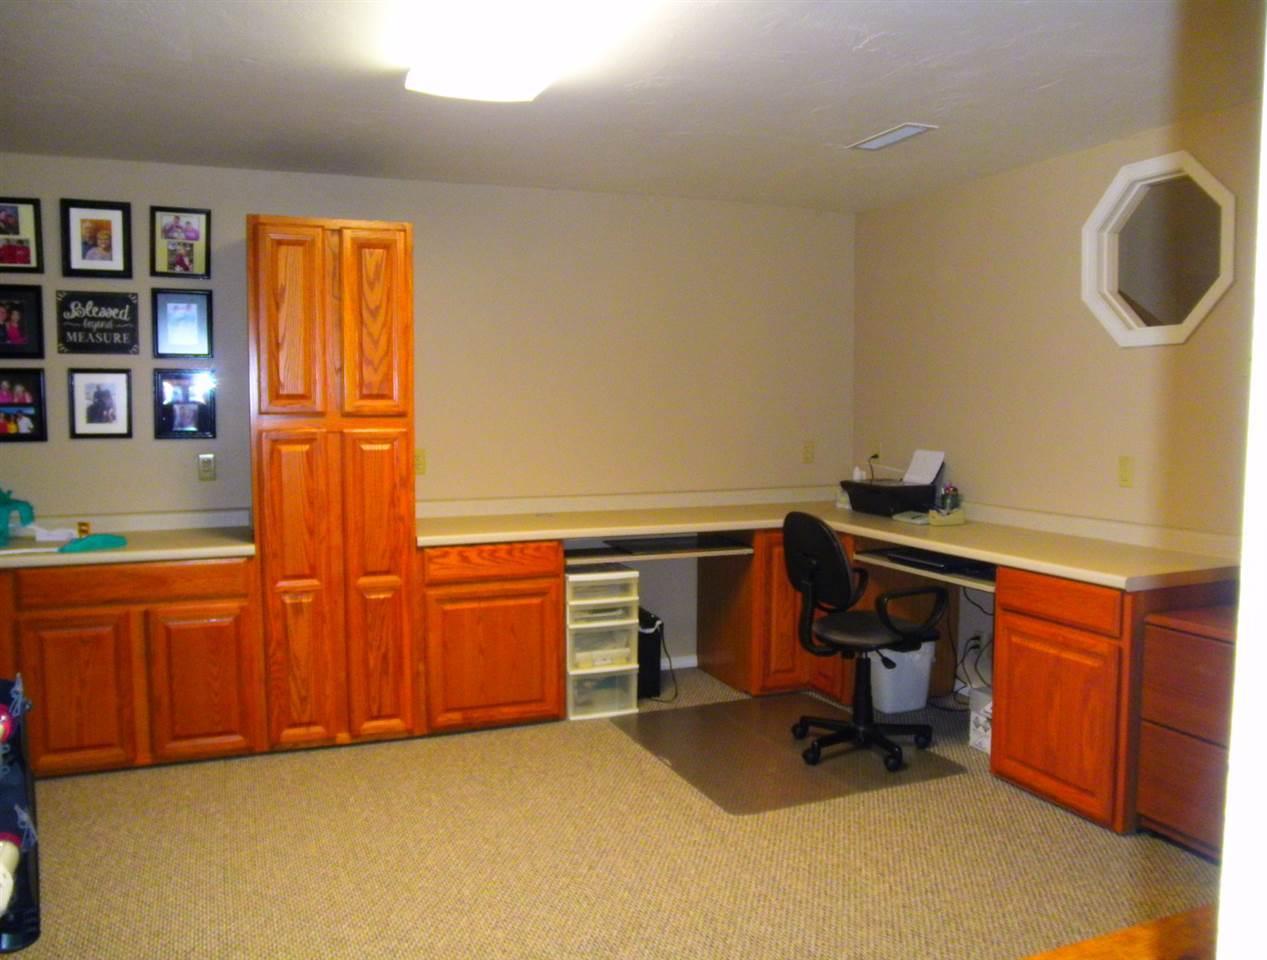 Sold Cross Sale W/ MLS | 32 Raintree Ponca City, OK 74604 28